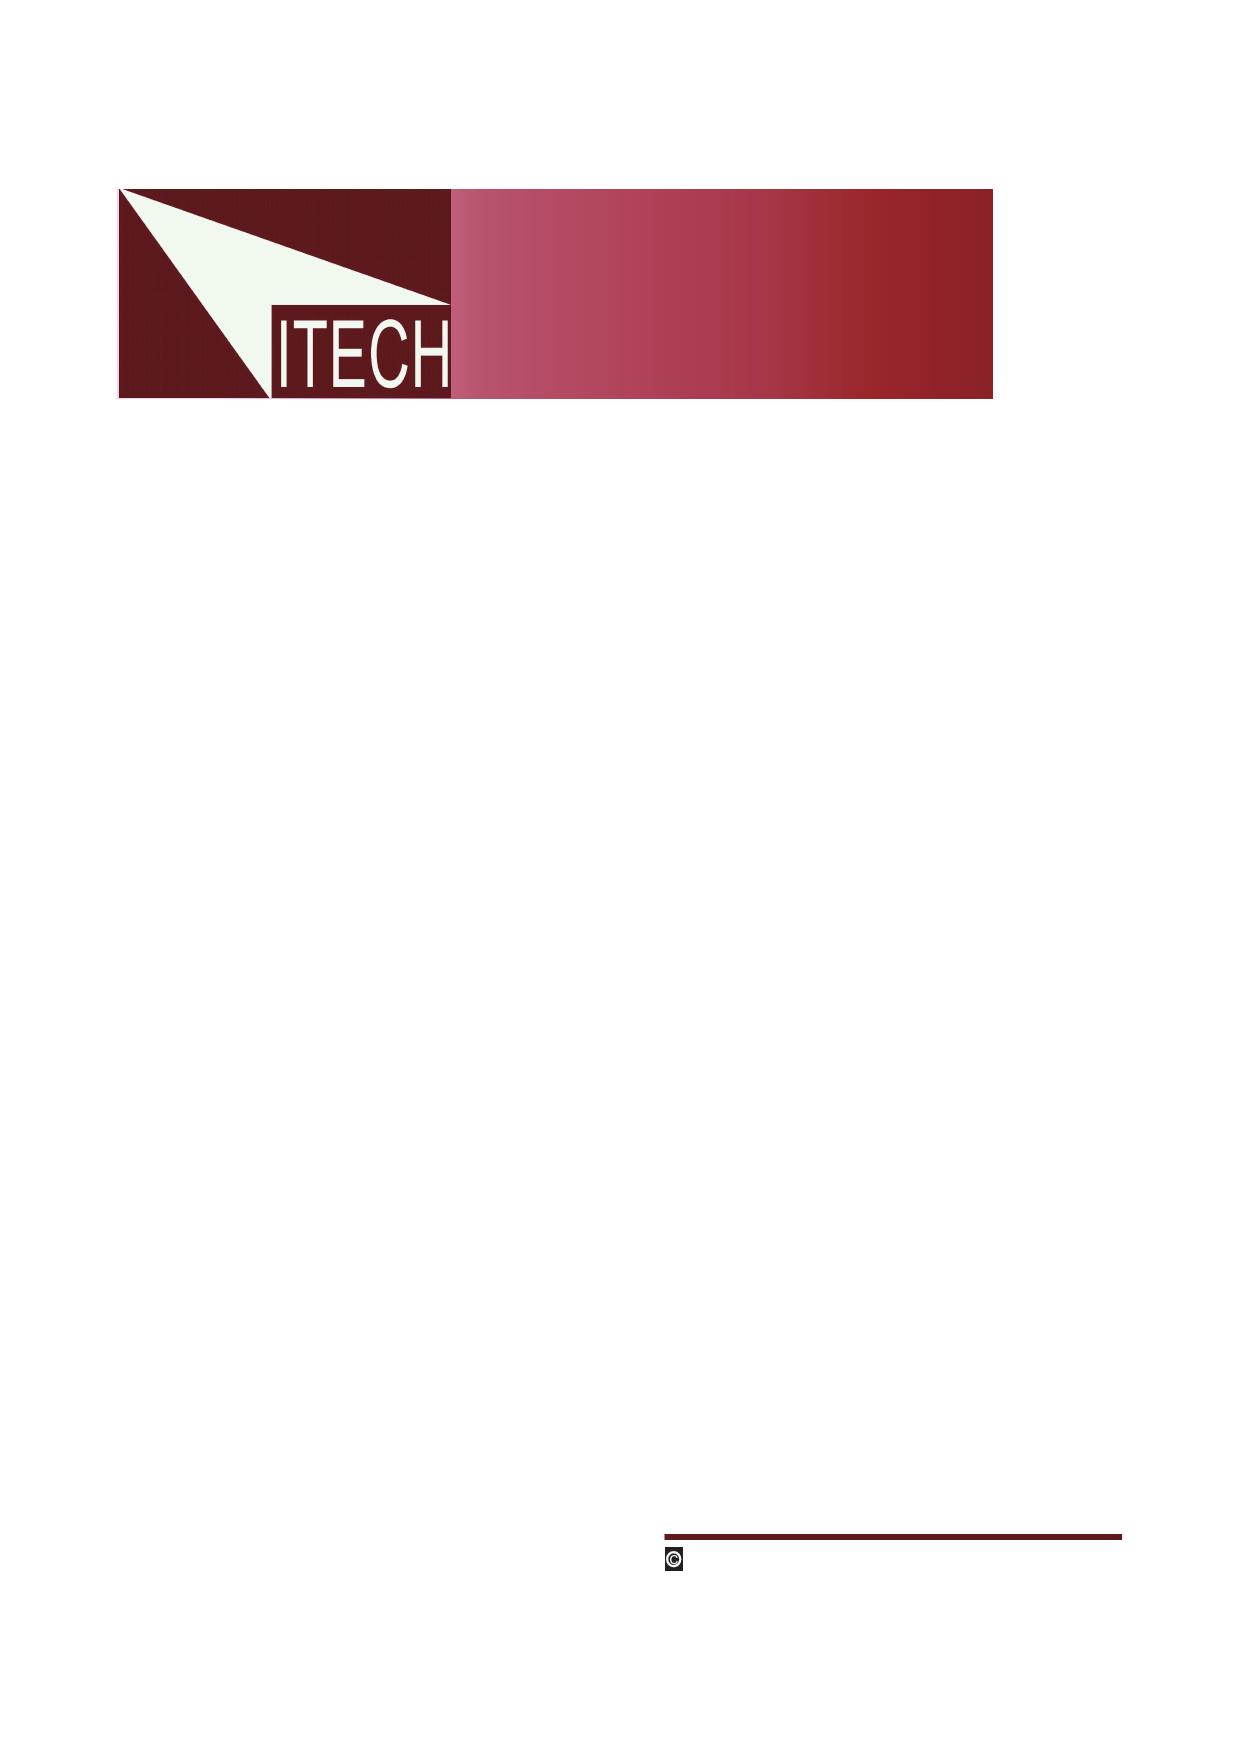 IT8518E 데이터시트 및 IT8518E PDF